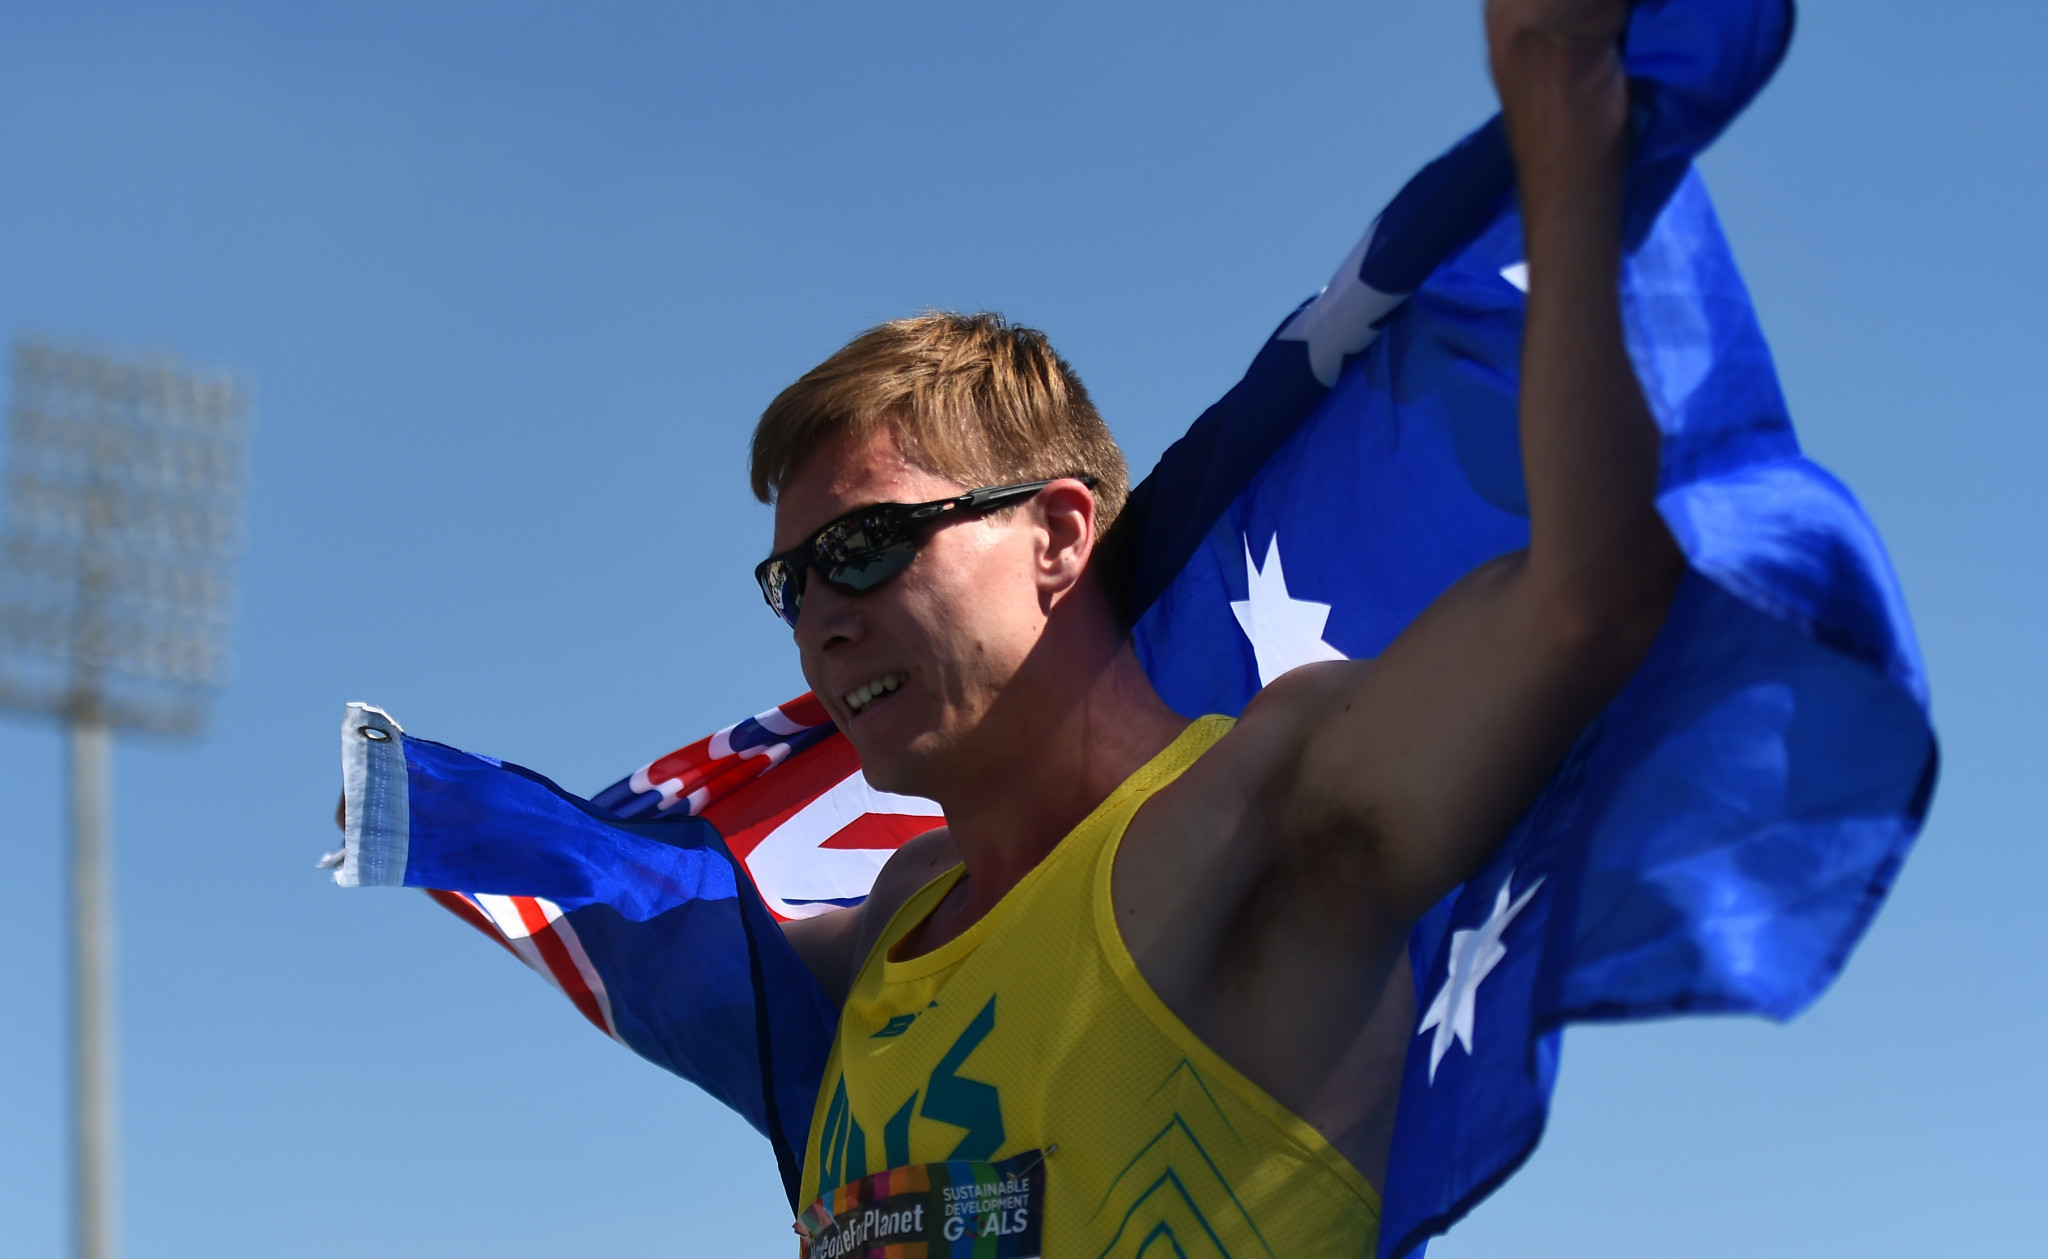 Turner breaks second world record at World Para Athletics Championships in Dubai